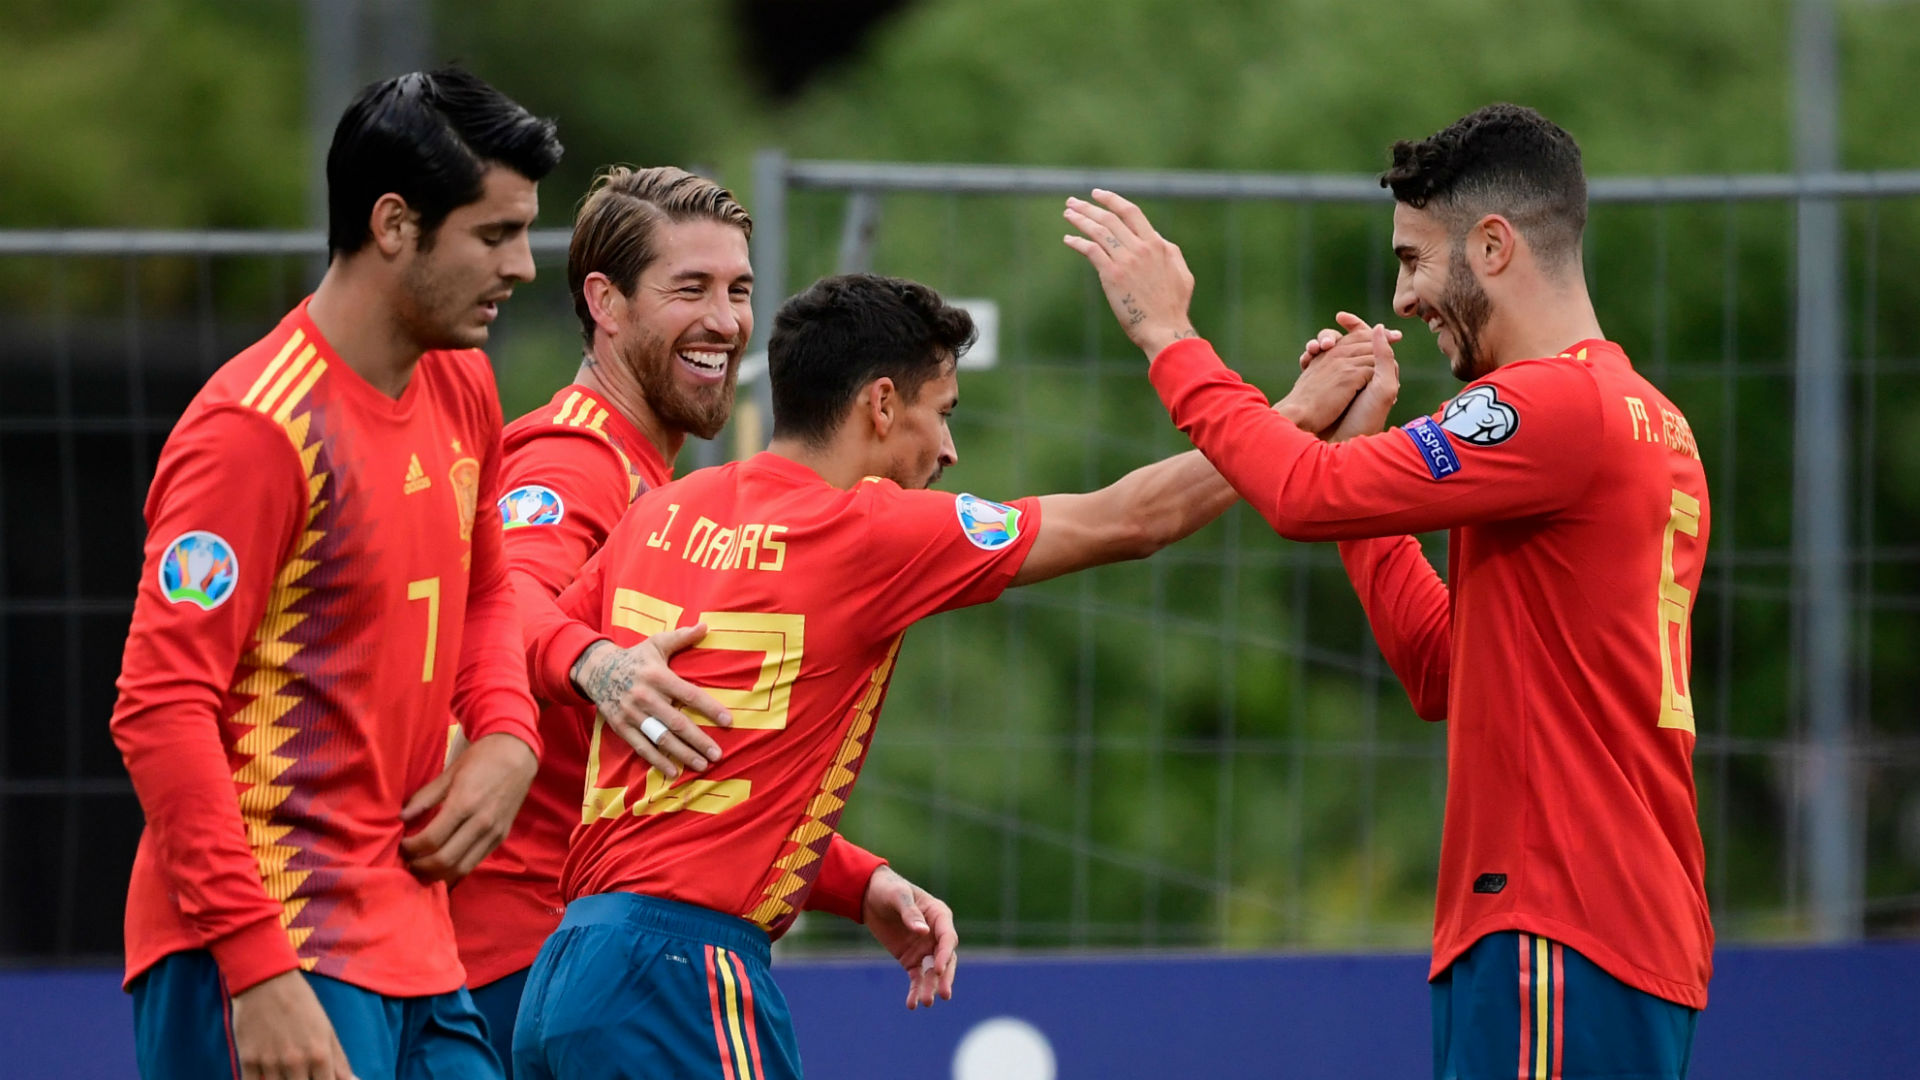 Faroe Islands 1 Spain 4: Ramos continues goalscoring run in comfortable road win